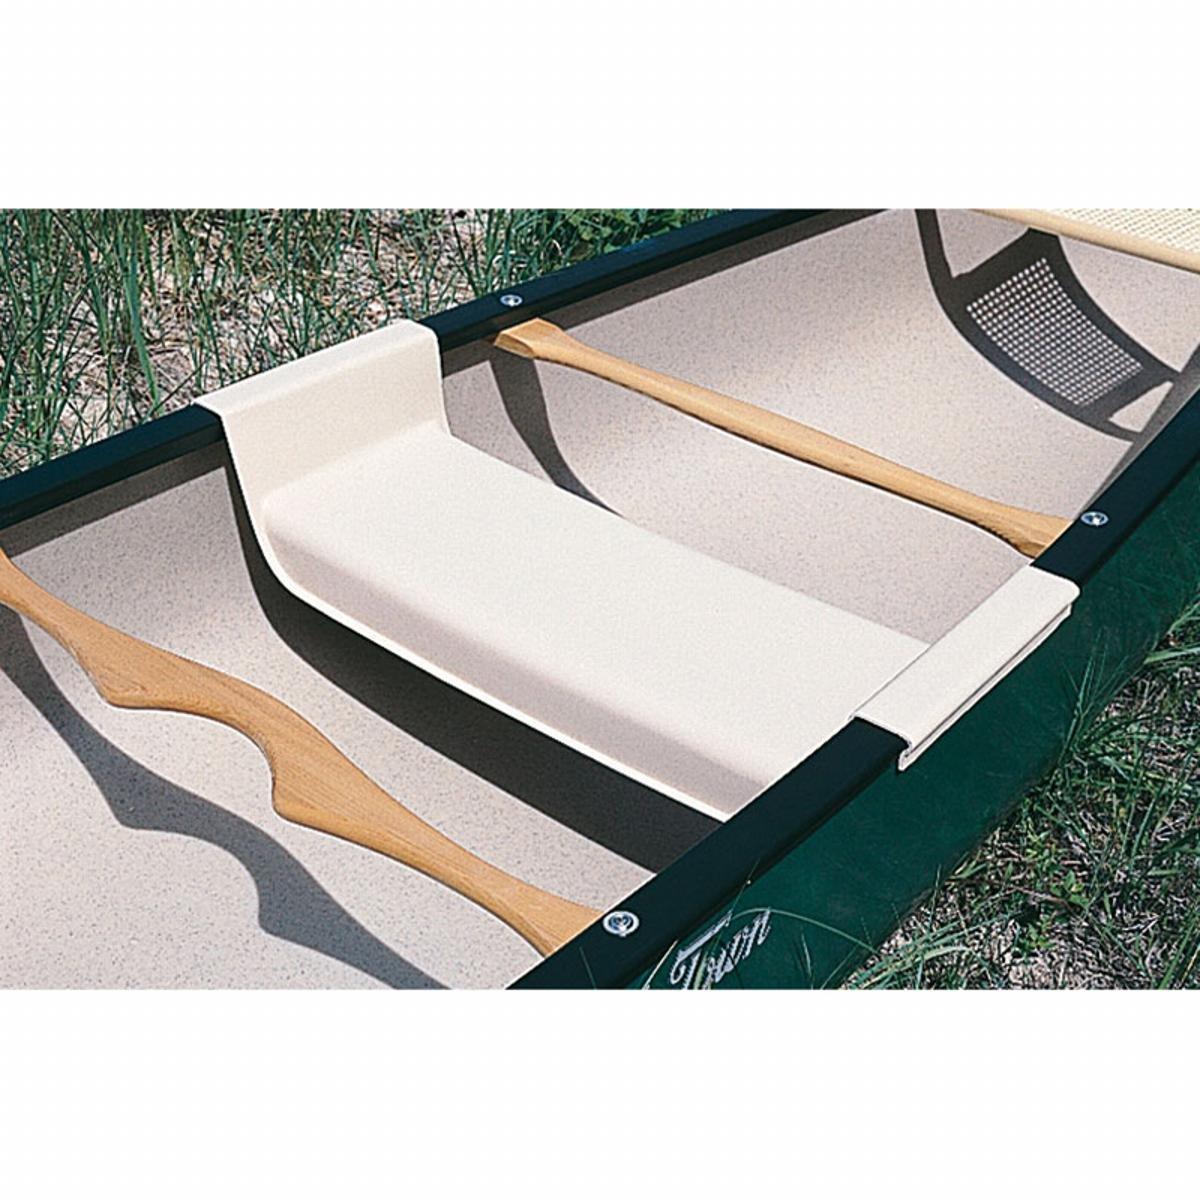 Canoe Center Seat Kit - DOES NOT FIT GRUMMAN EAGLE CANOE! Grumman